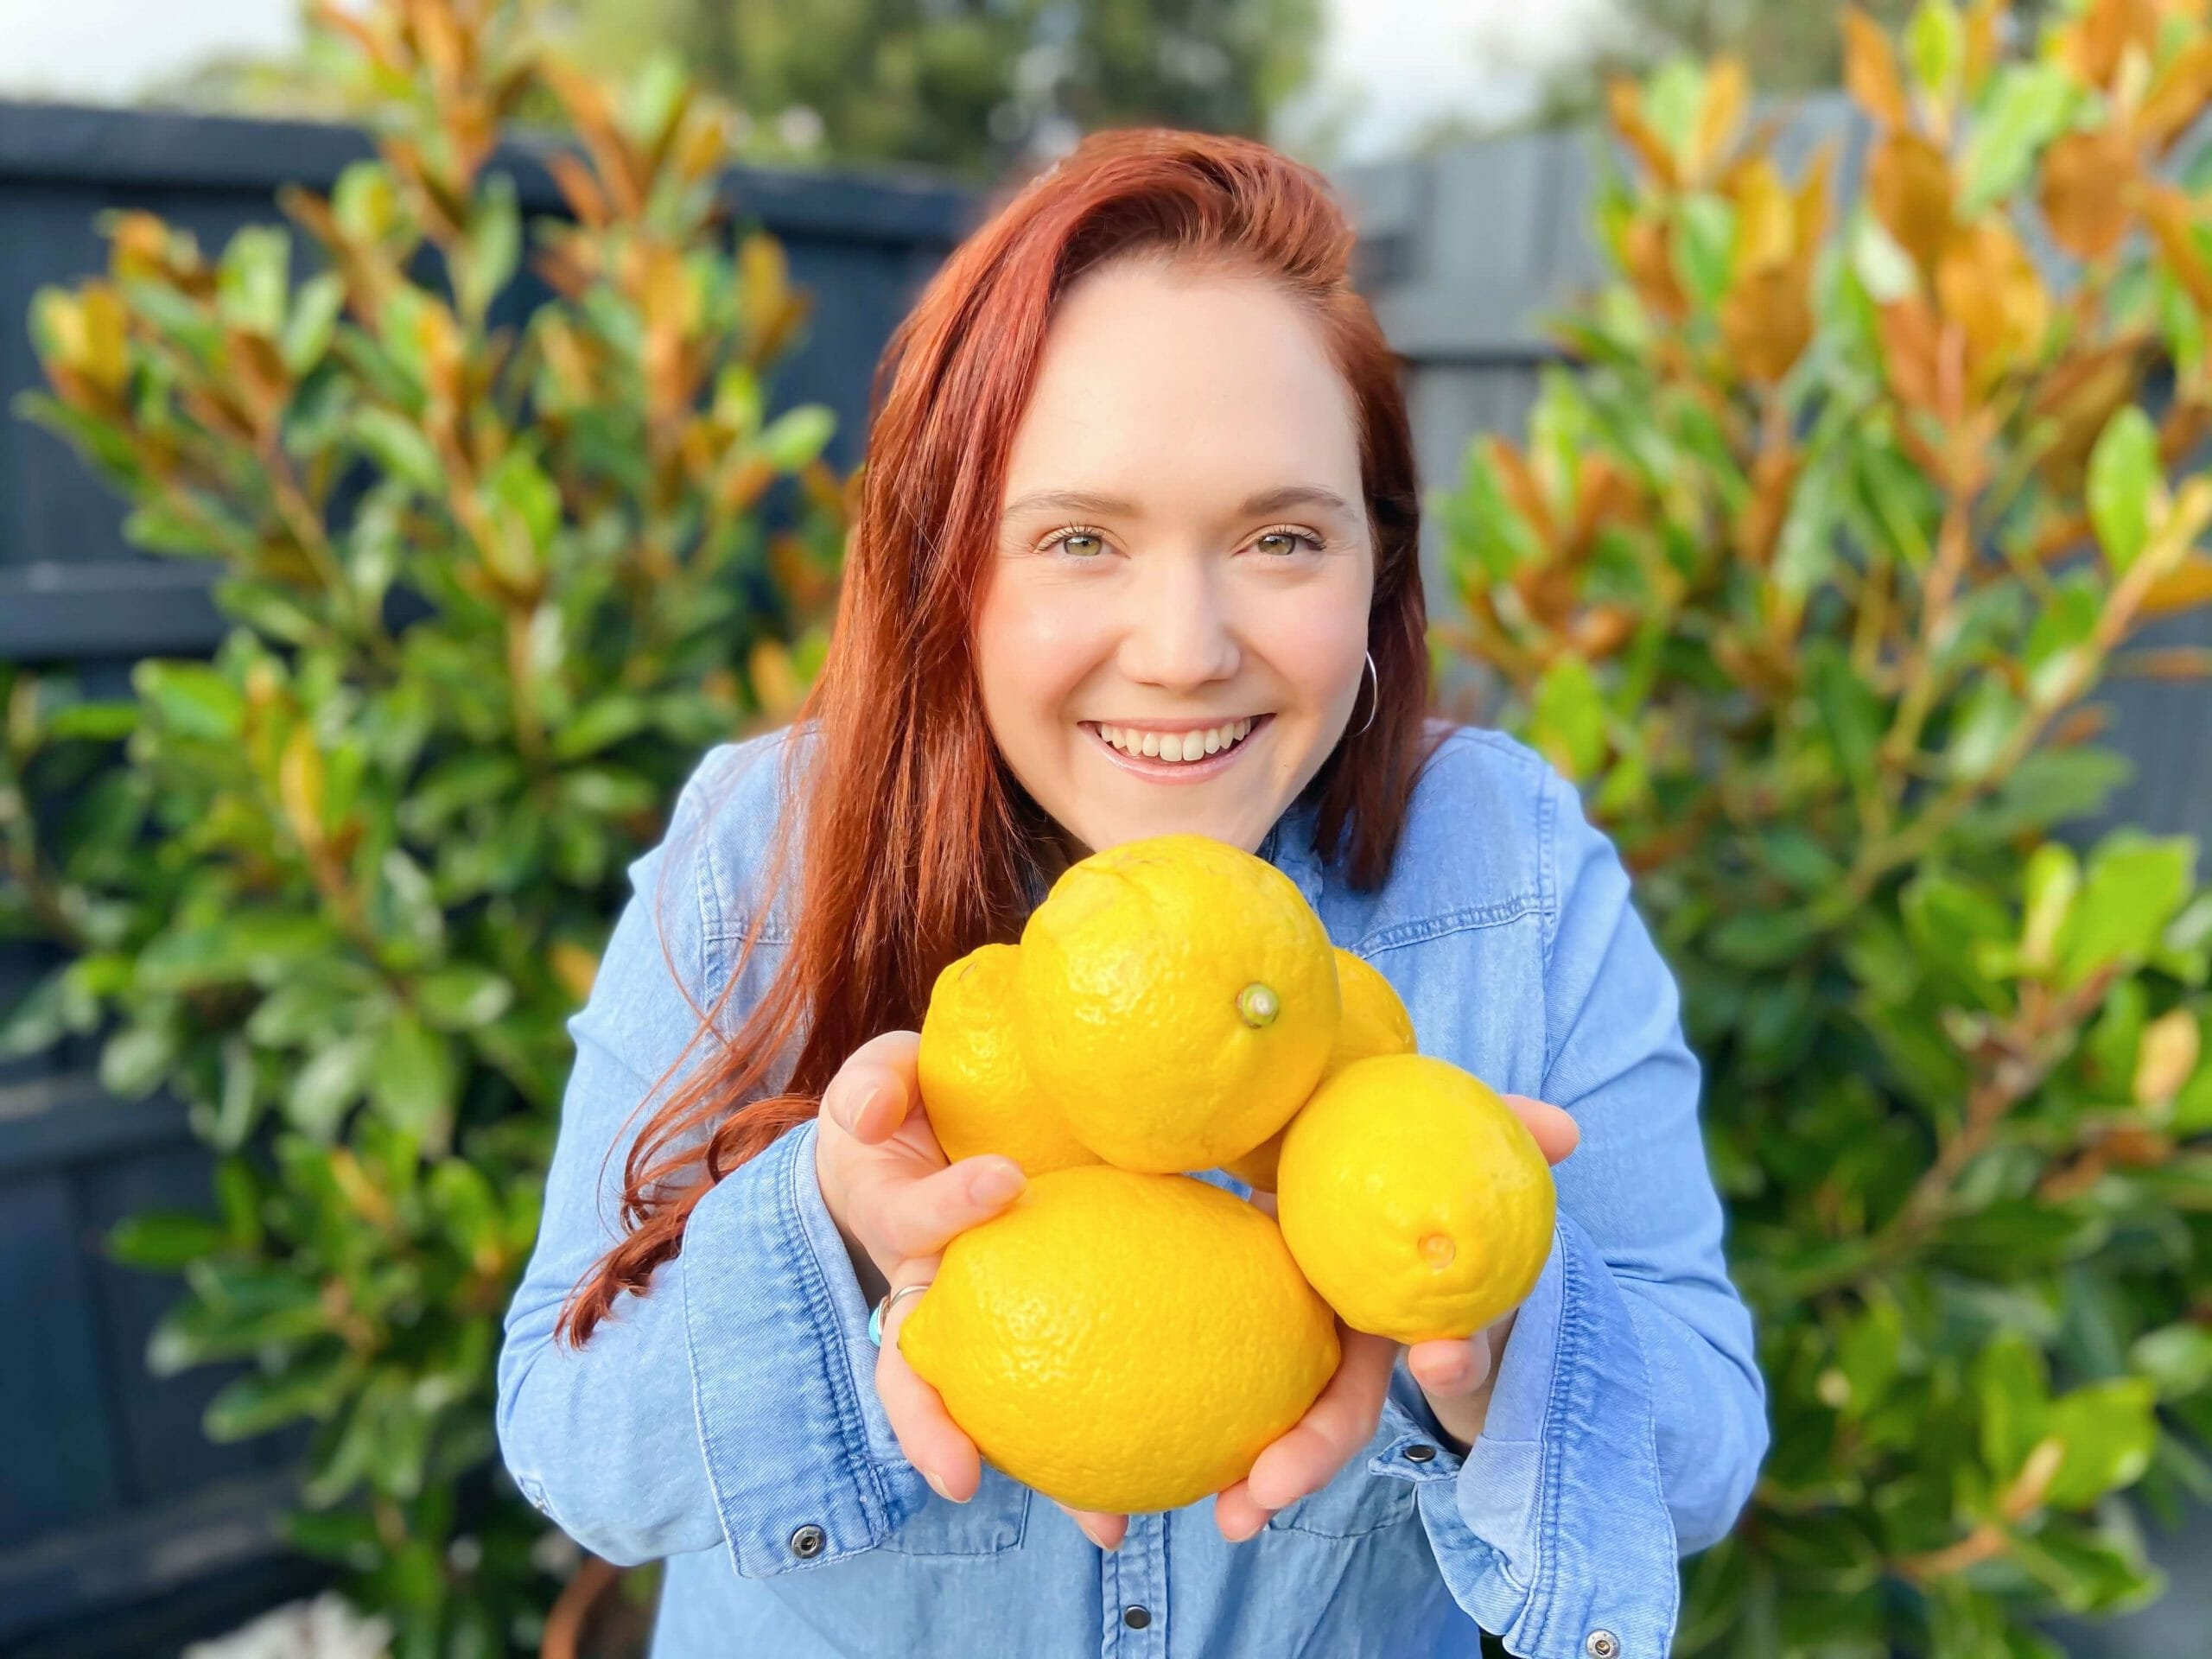 4 Steps To Turn Life's Lemons Into Lemonade